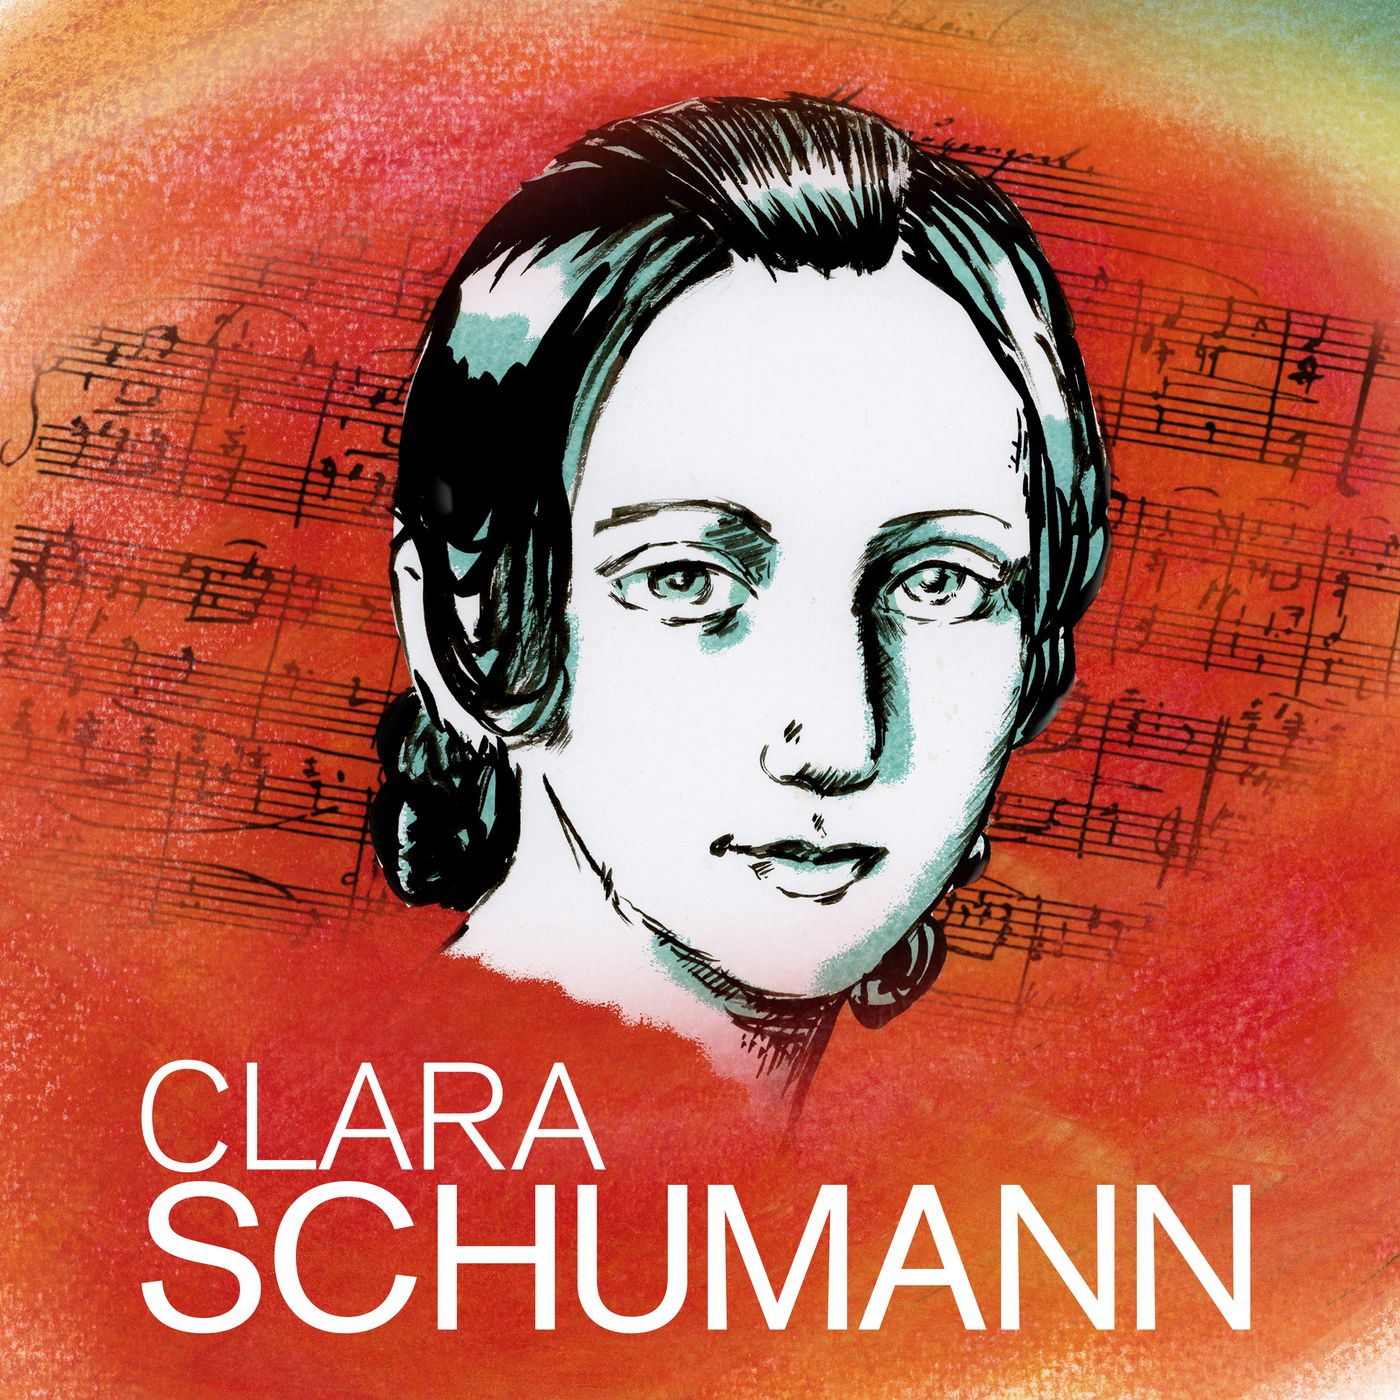 Clara Schumann - Pianisten som tog publiken med storm